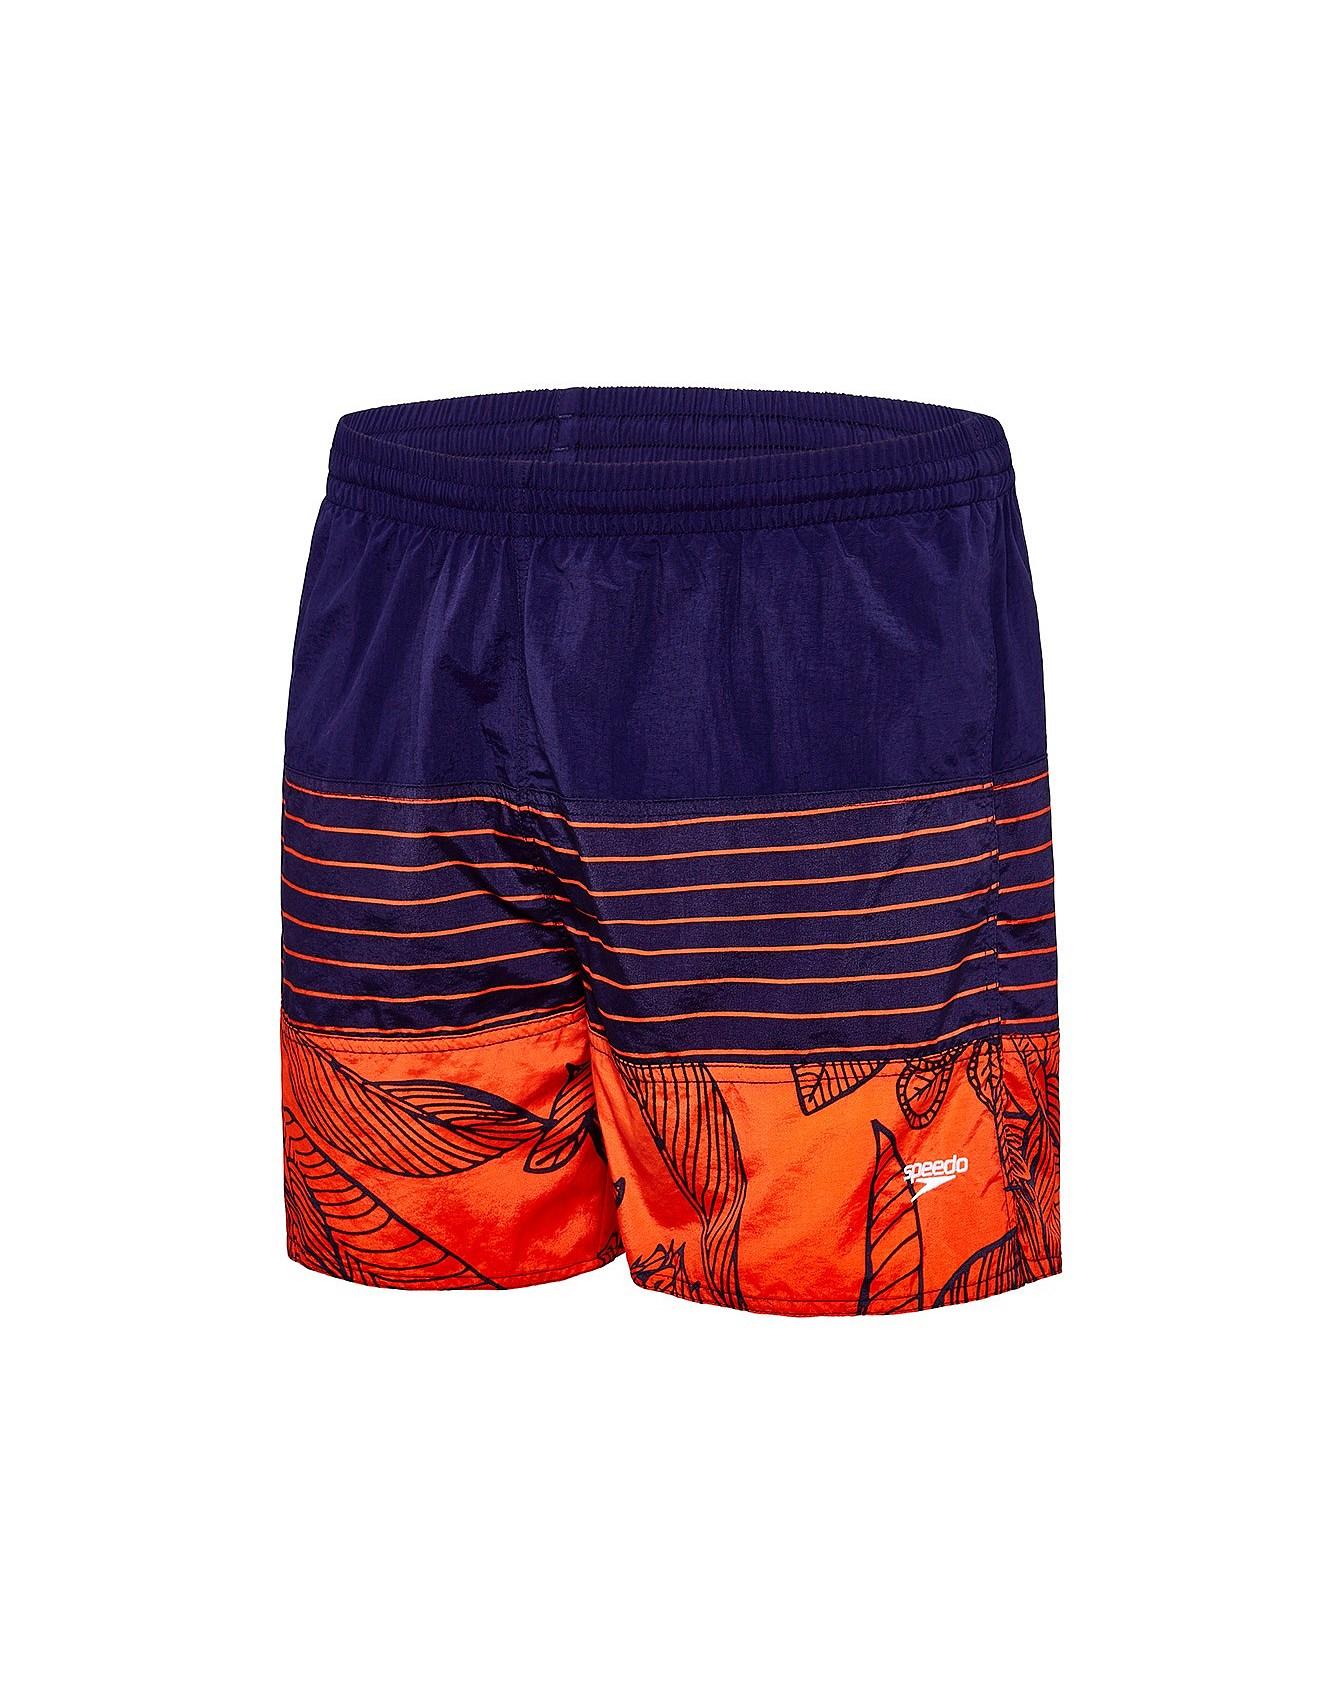 6323e6d8bfa992 Men's Swimwear | Boardshorts & Swim Shorts | David Jones - PANEL ...